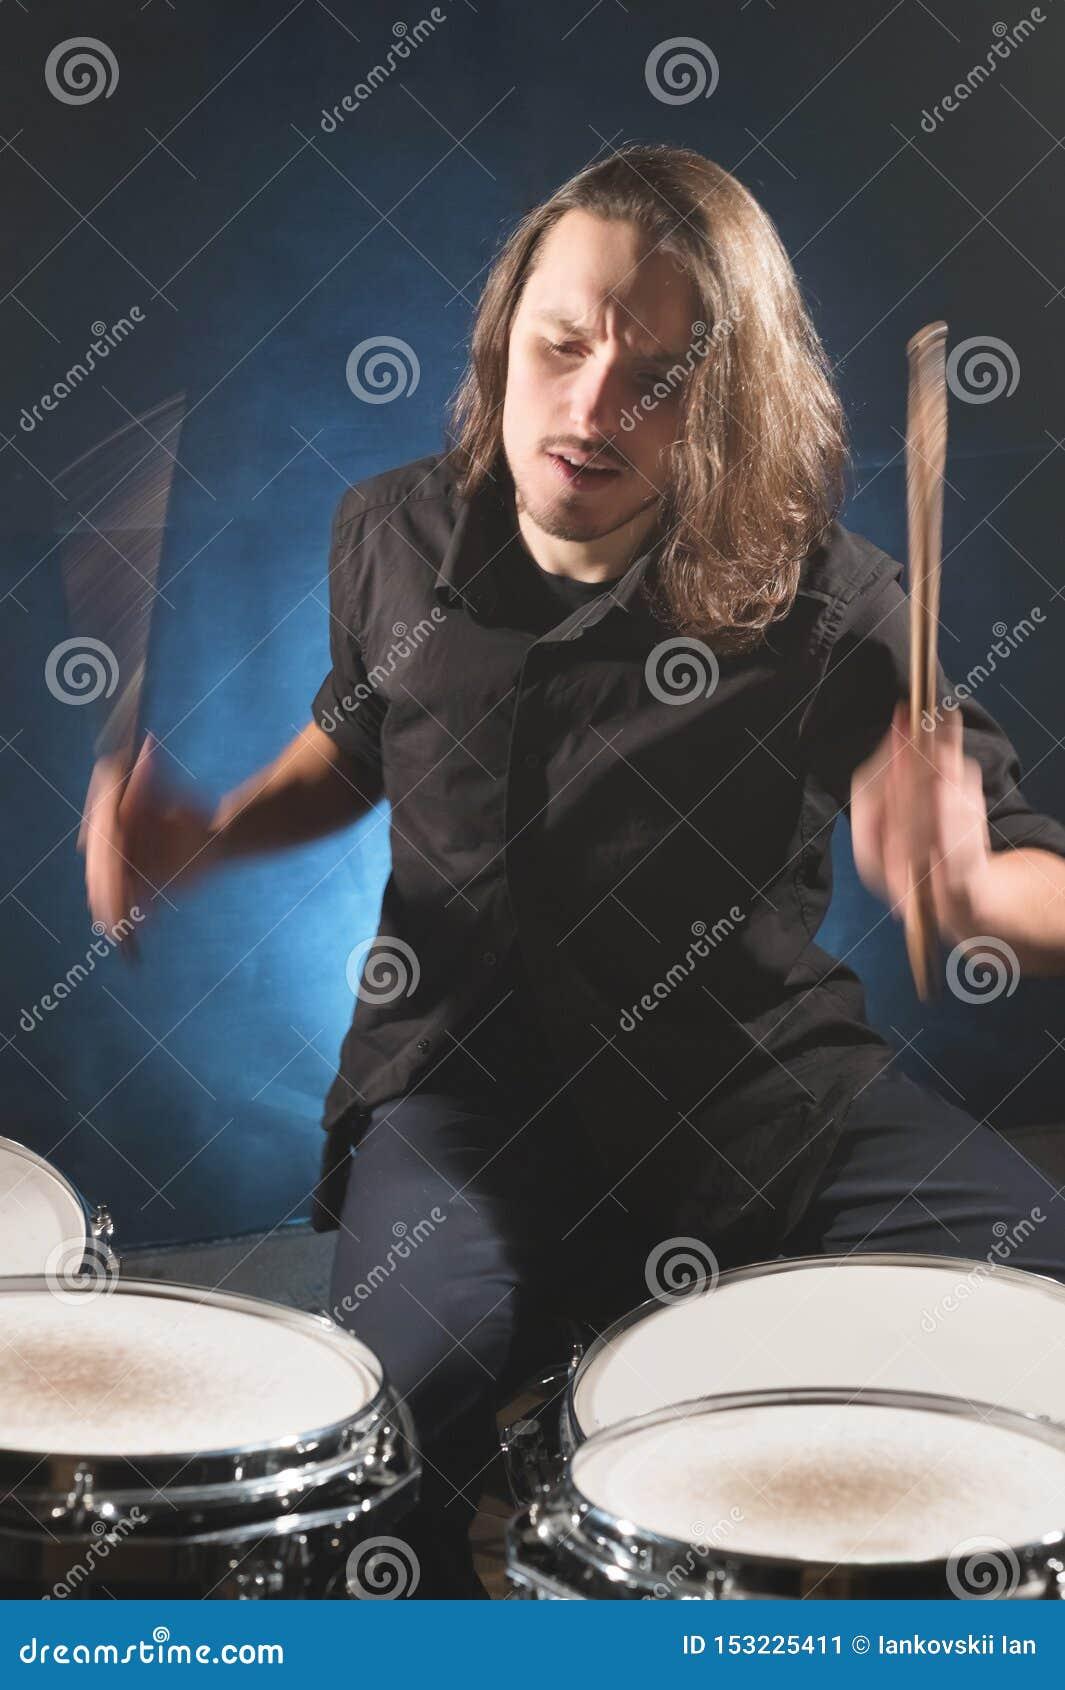 Портрет длинн-с волосами барабанщика с палочками в его руках сидя за набором барабанчика Низкий ключ Концепции